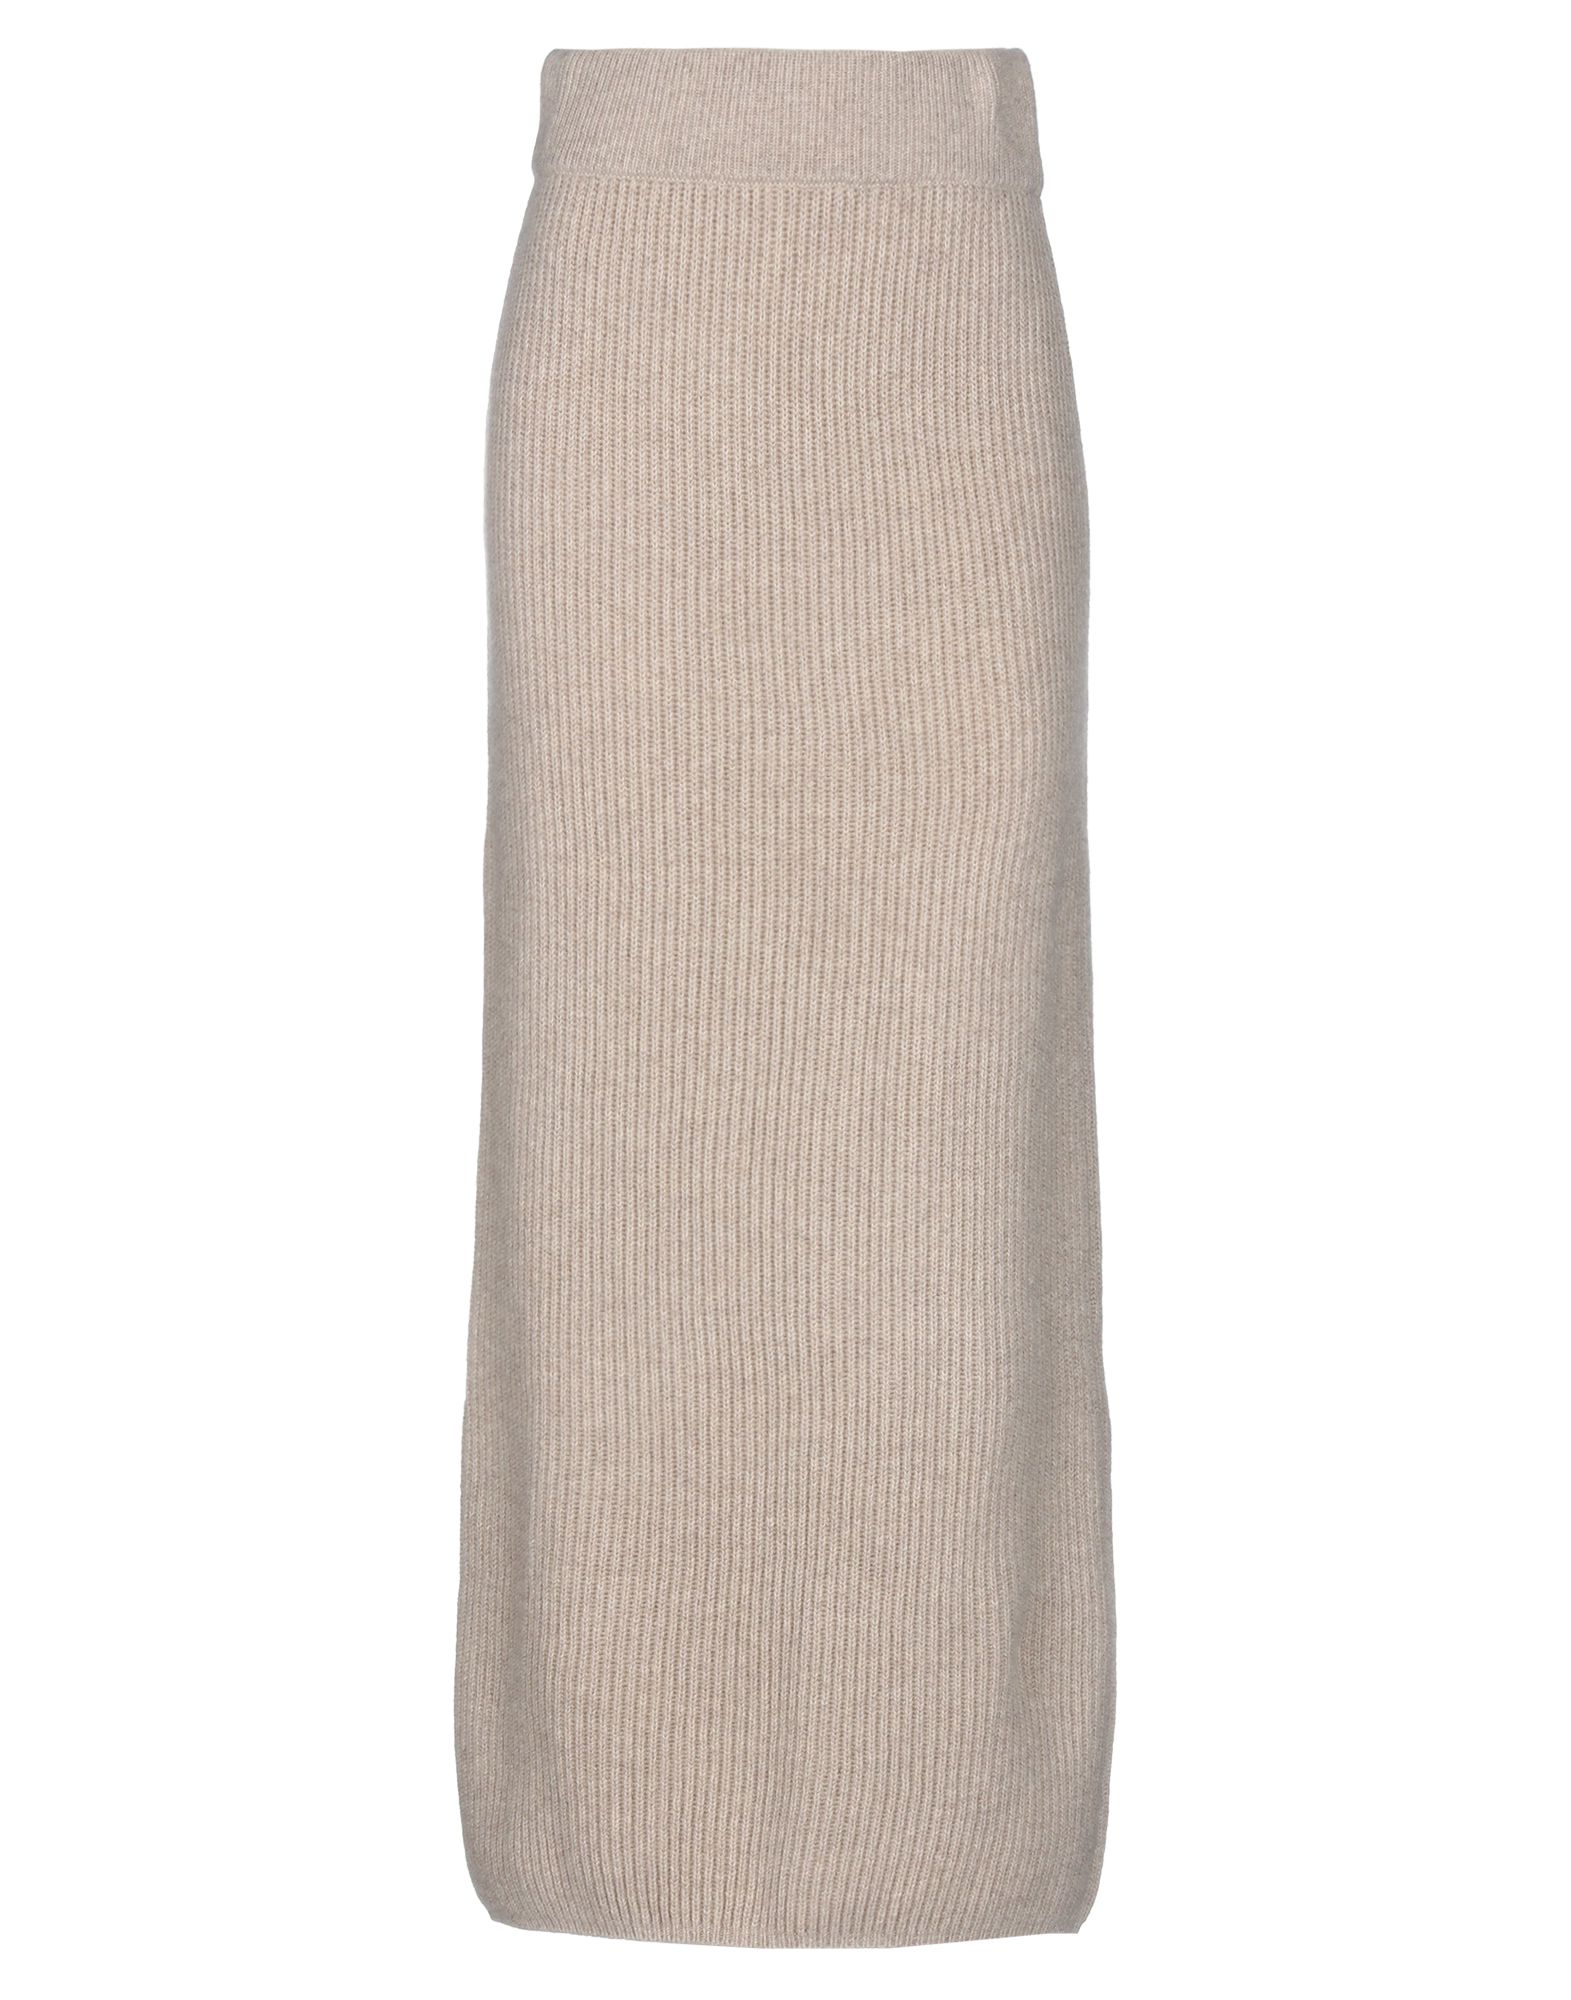 N.O.W. ANDREA ROSATI CASHMERE Длинная юбка